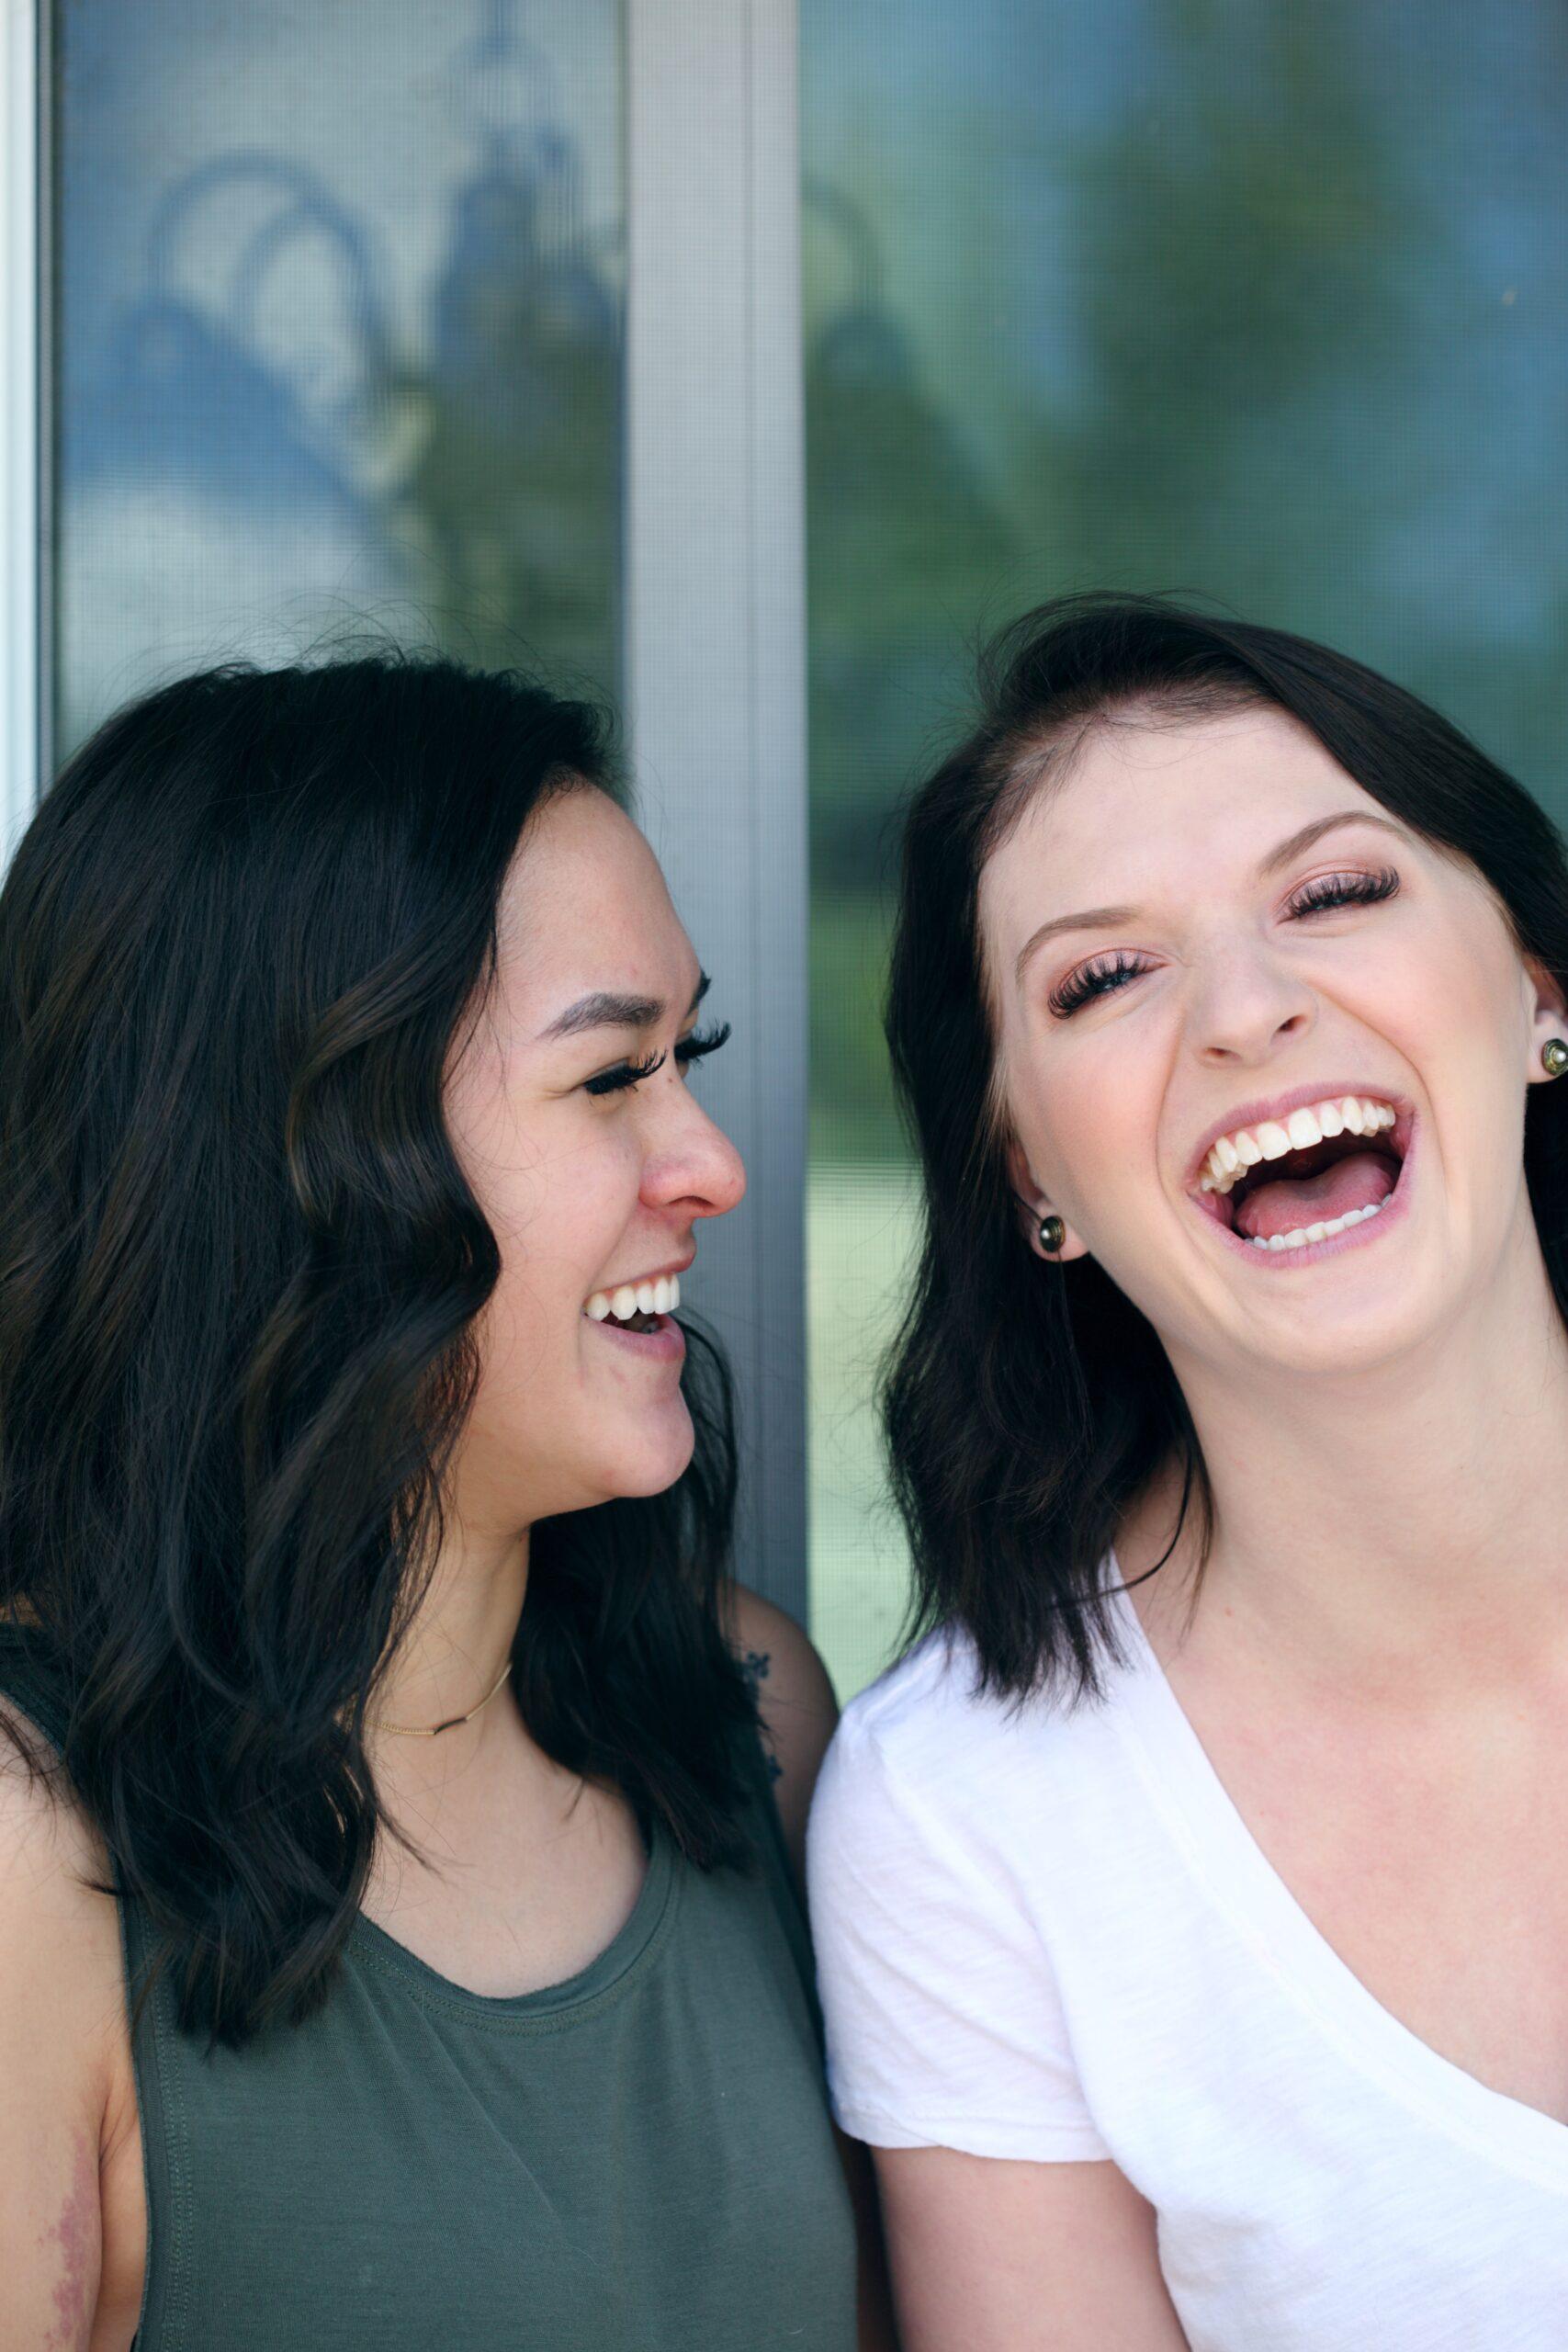 sharon-mccutcheon-female couple laughing together-unsplash